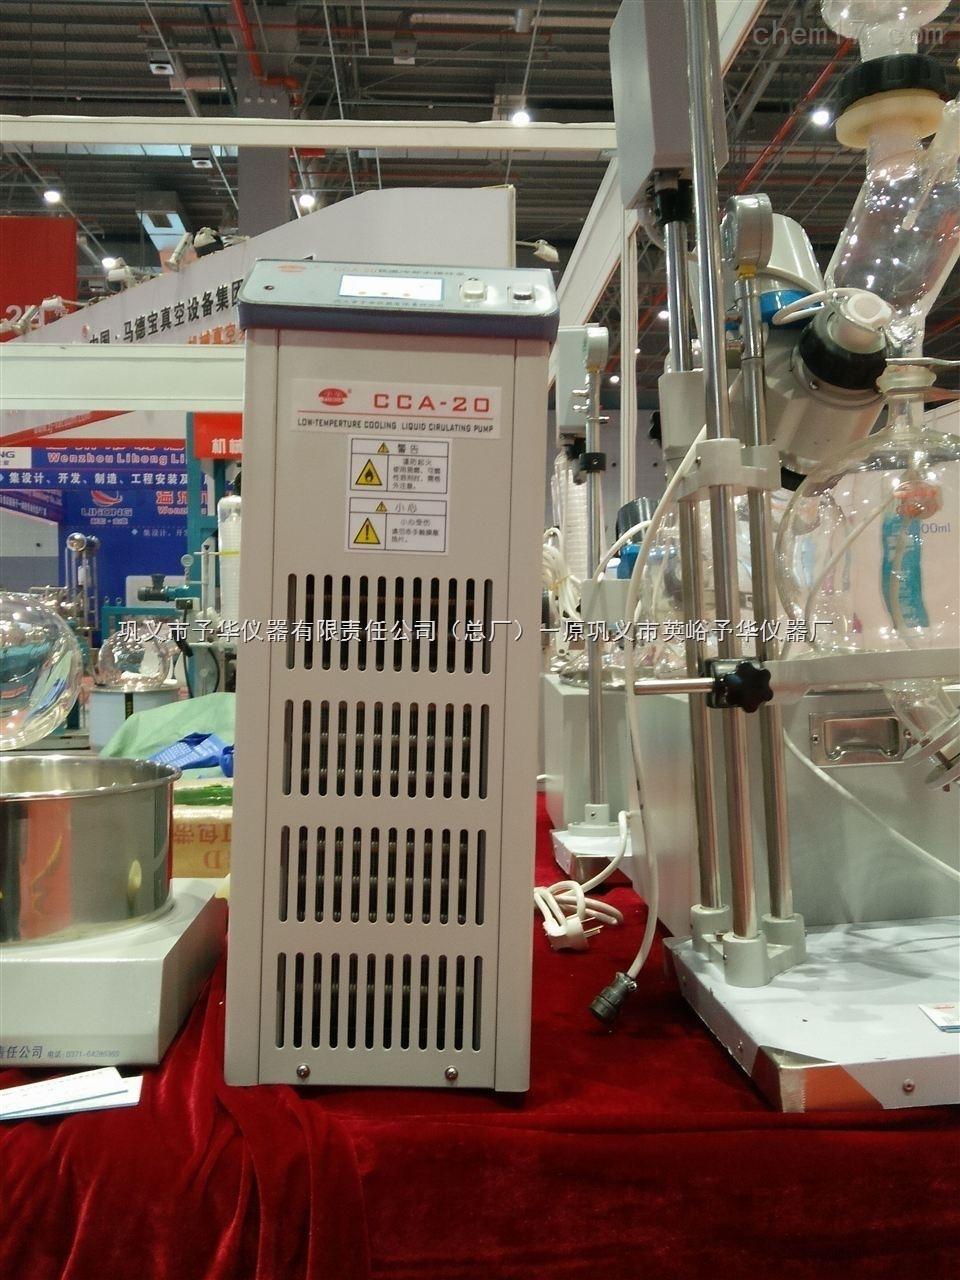 CCA-20小型冷却水循环泵小型旋转专用配套使用设备—予华牌